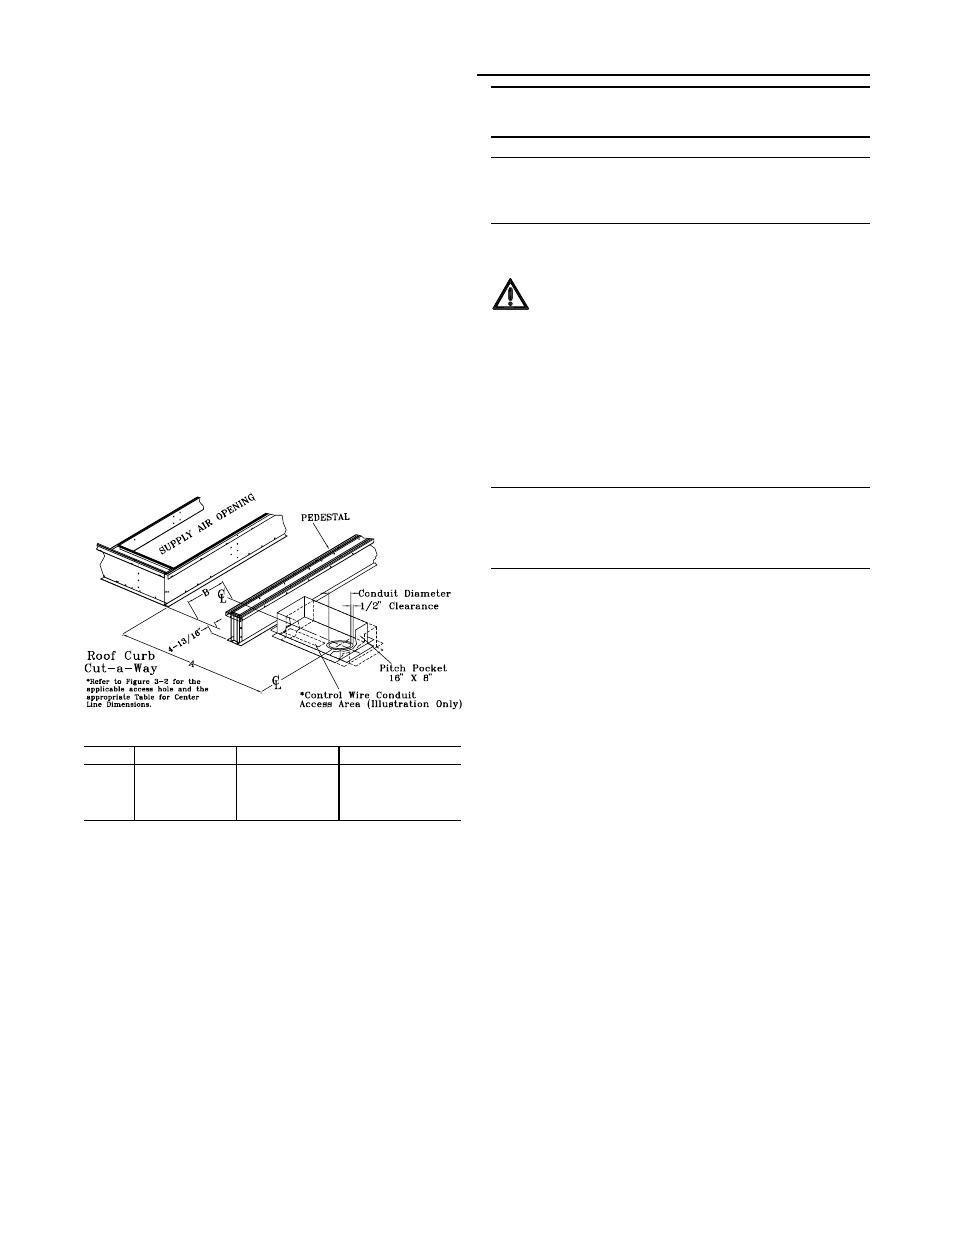 Dorable Trane Condenser Wiring Diagram Vignette - Wiring Diagram ...